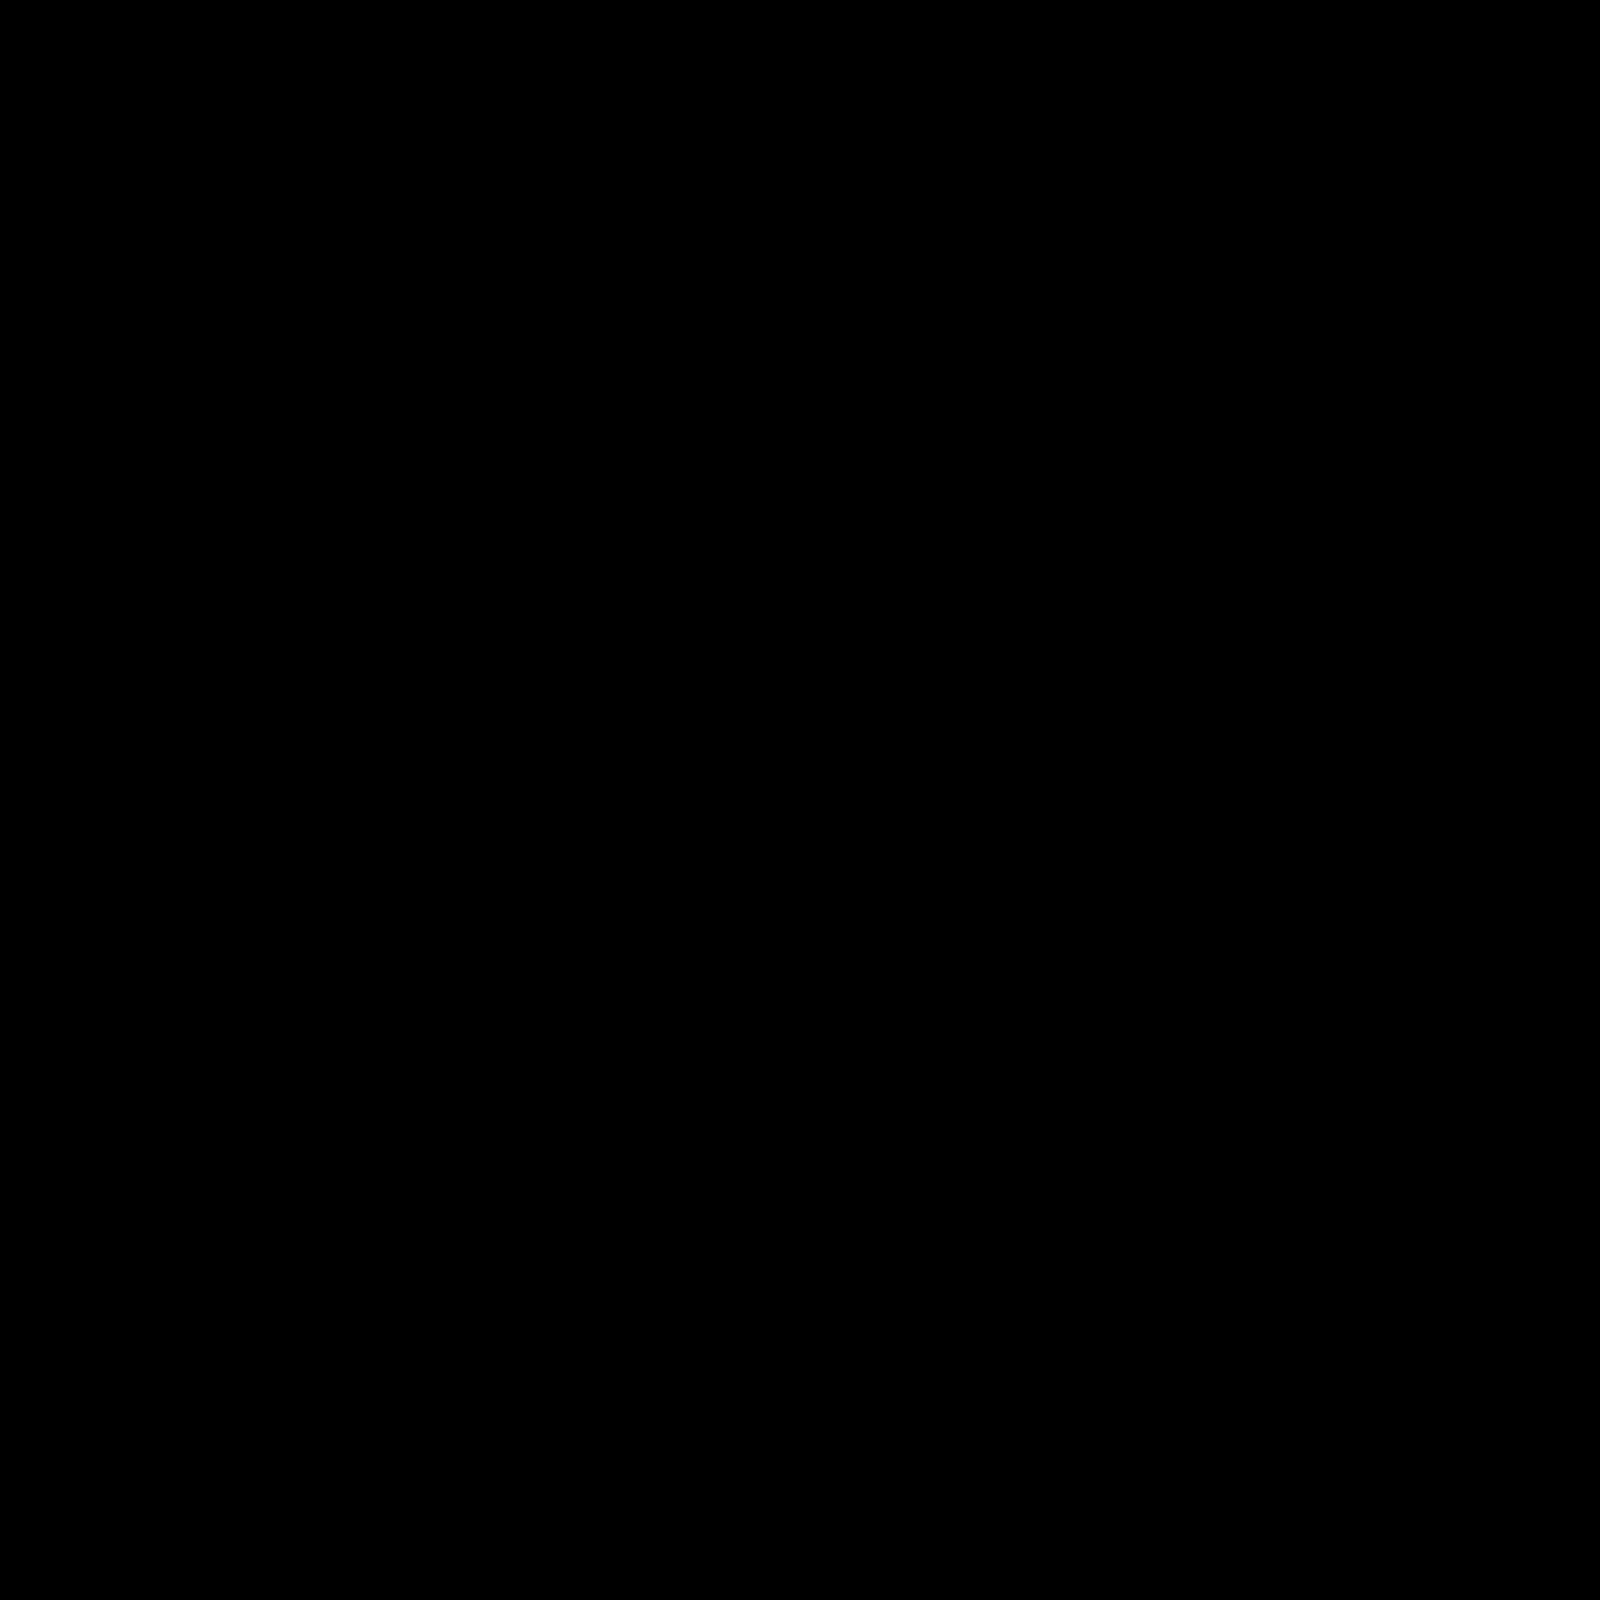 Softball Mitt icon